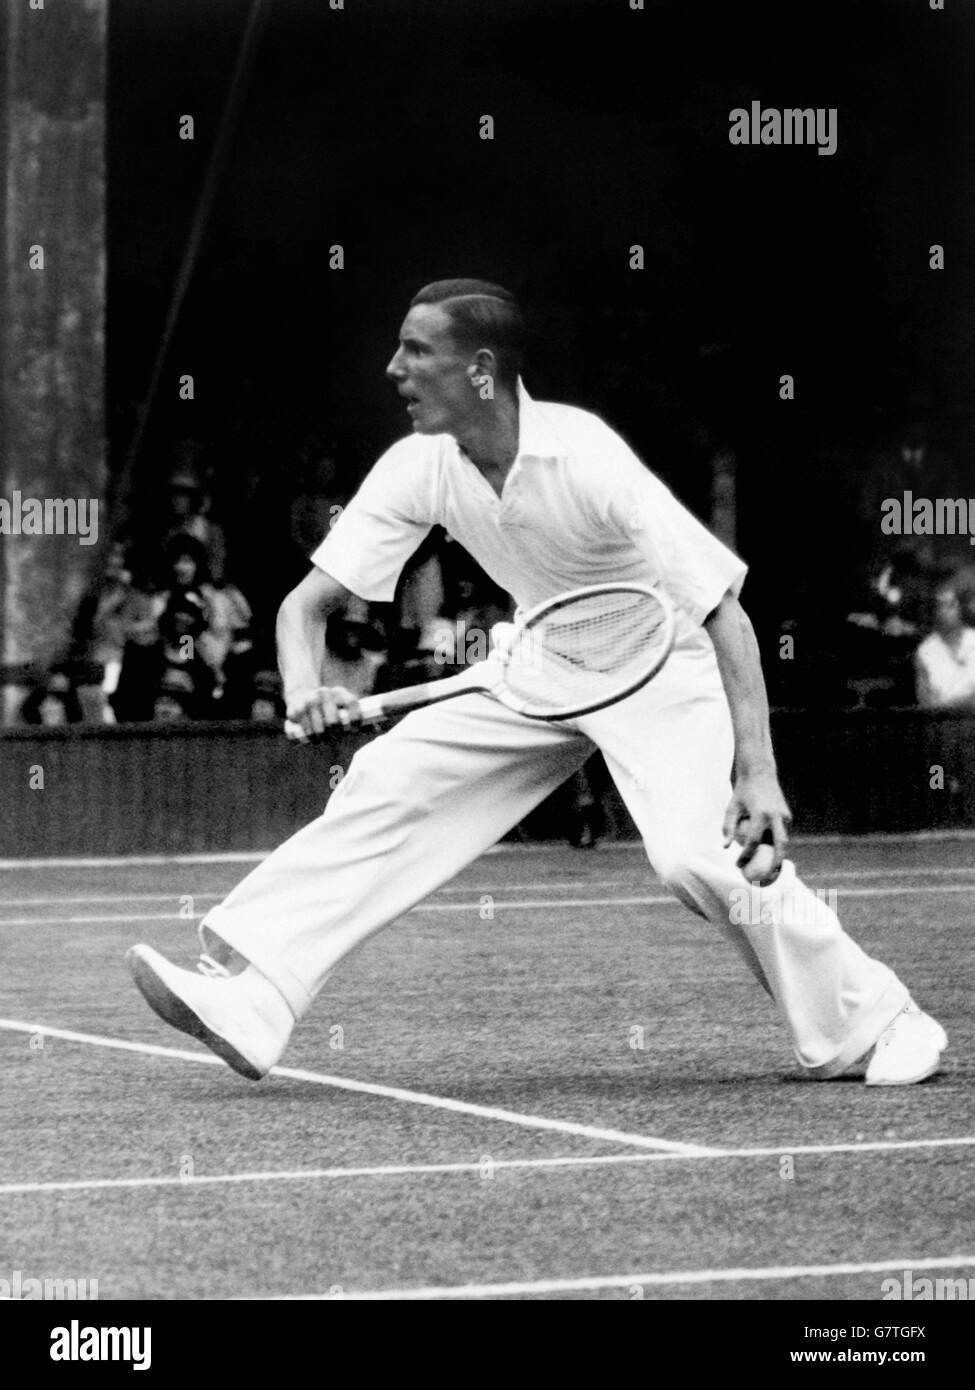 Tennis - Wimbledon Championships - Stock Image